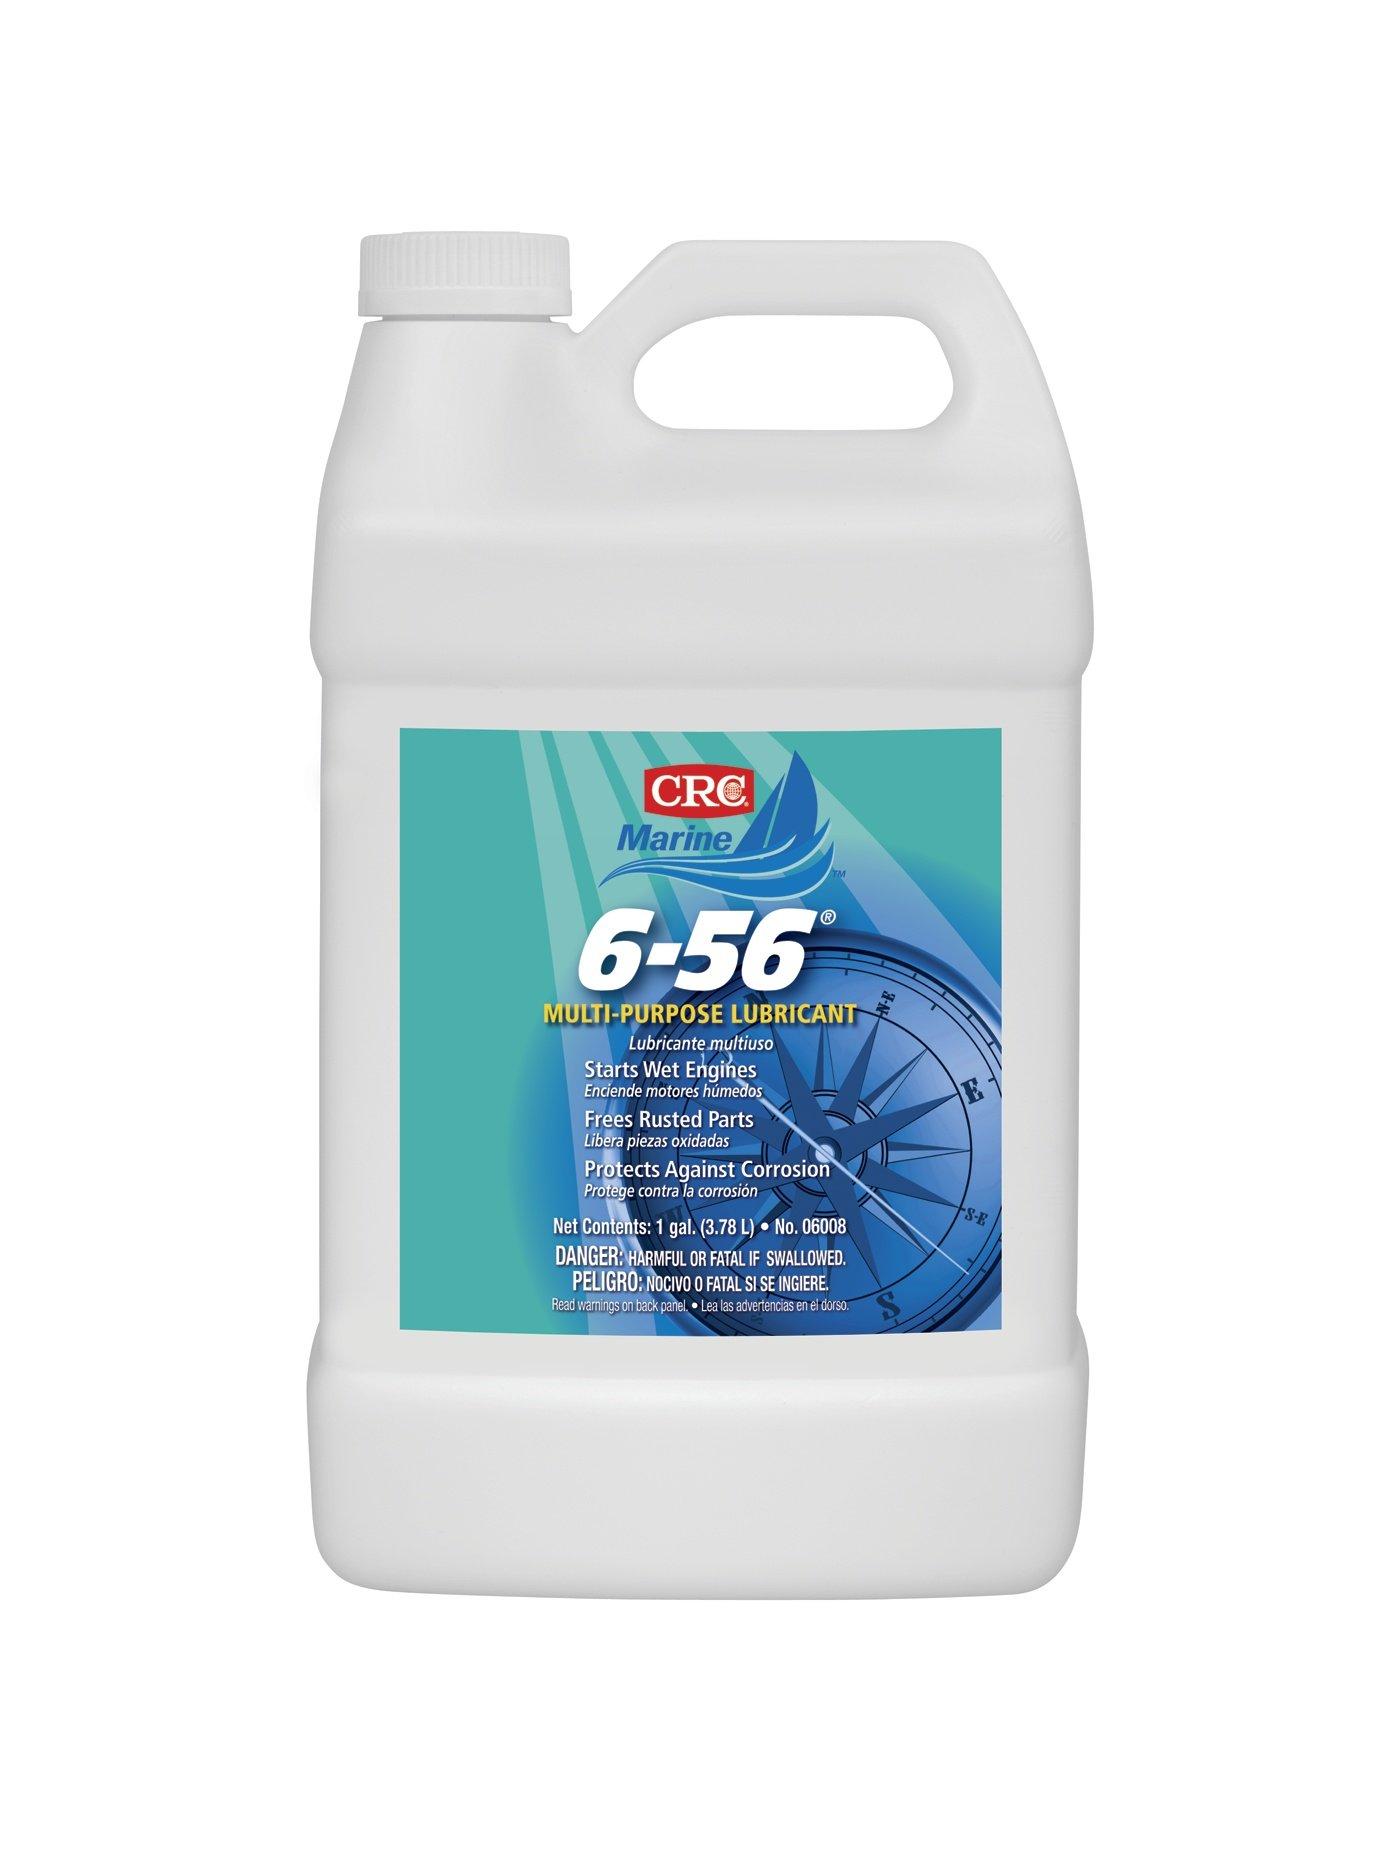 CRC 6008 6-56 Multi-Purpose Lubricant, 1 Gal